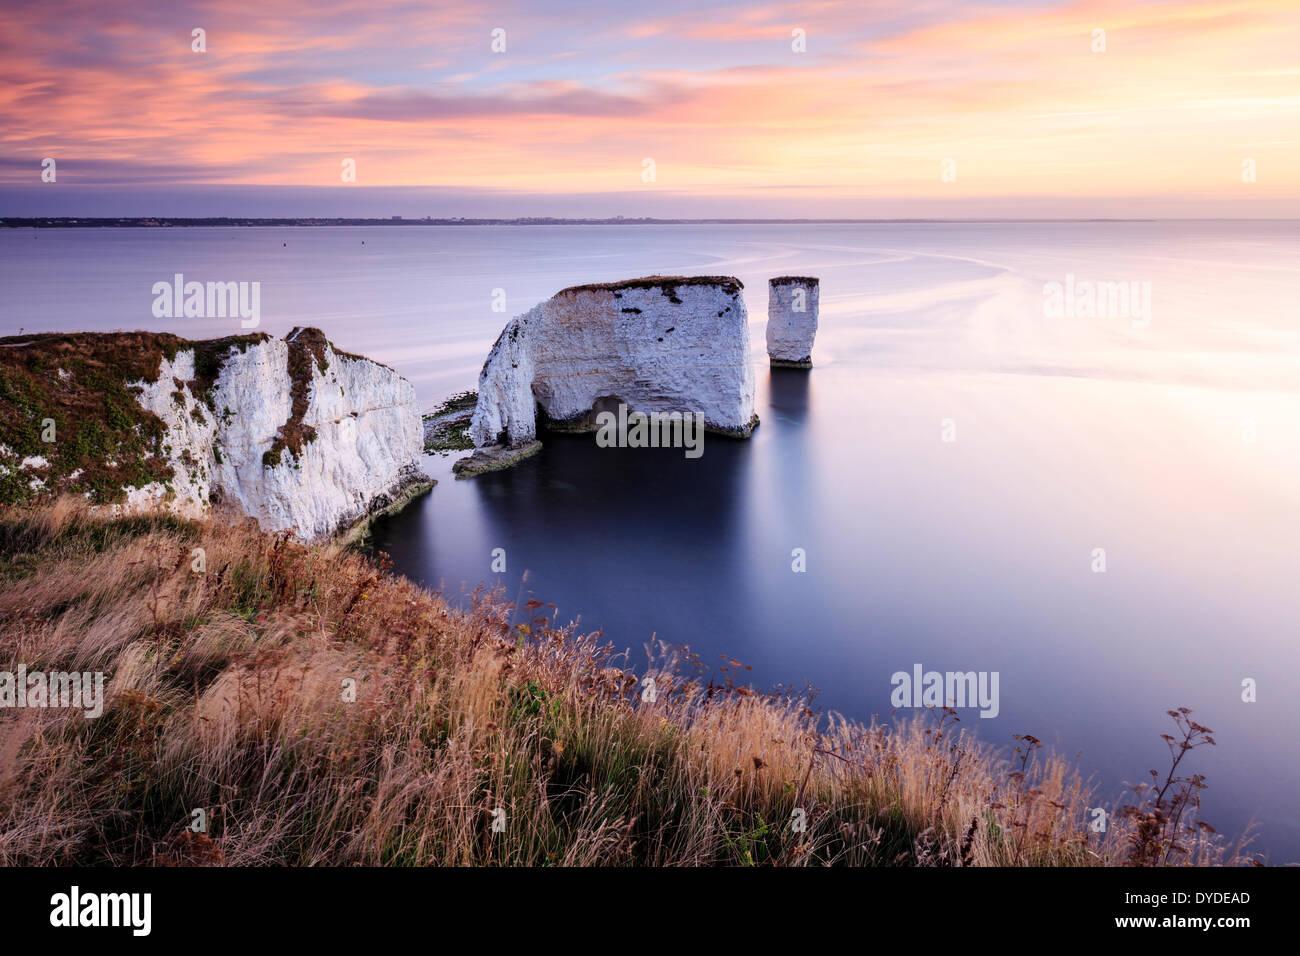 Sunrise over Old Harry Rocks in Dorset. - Stock Image